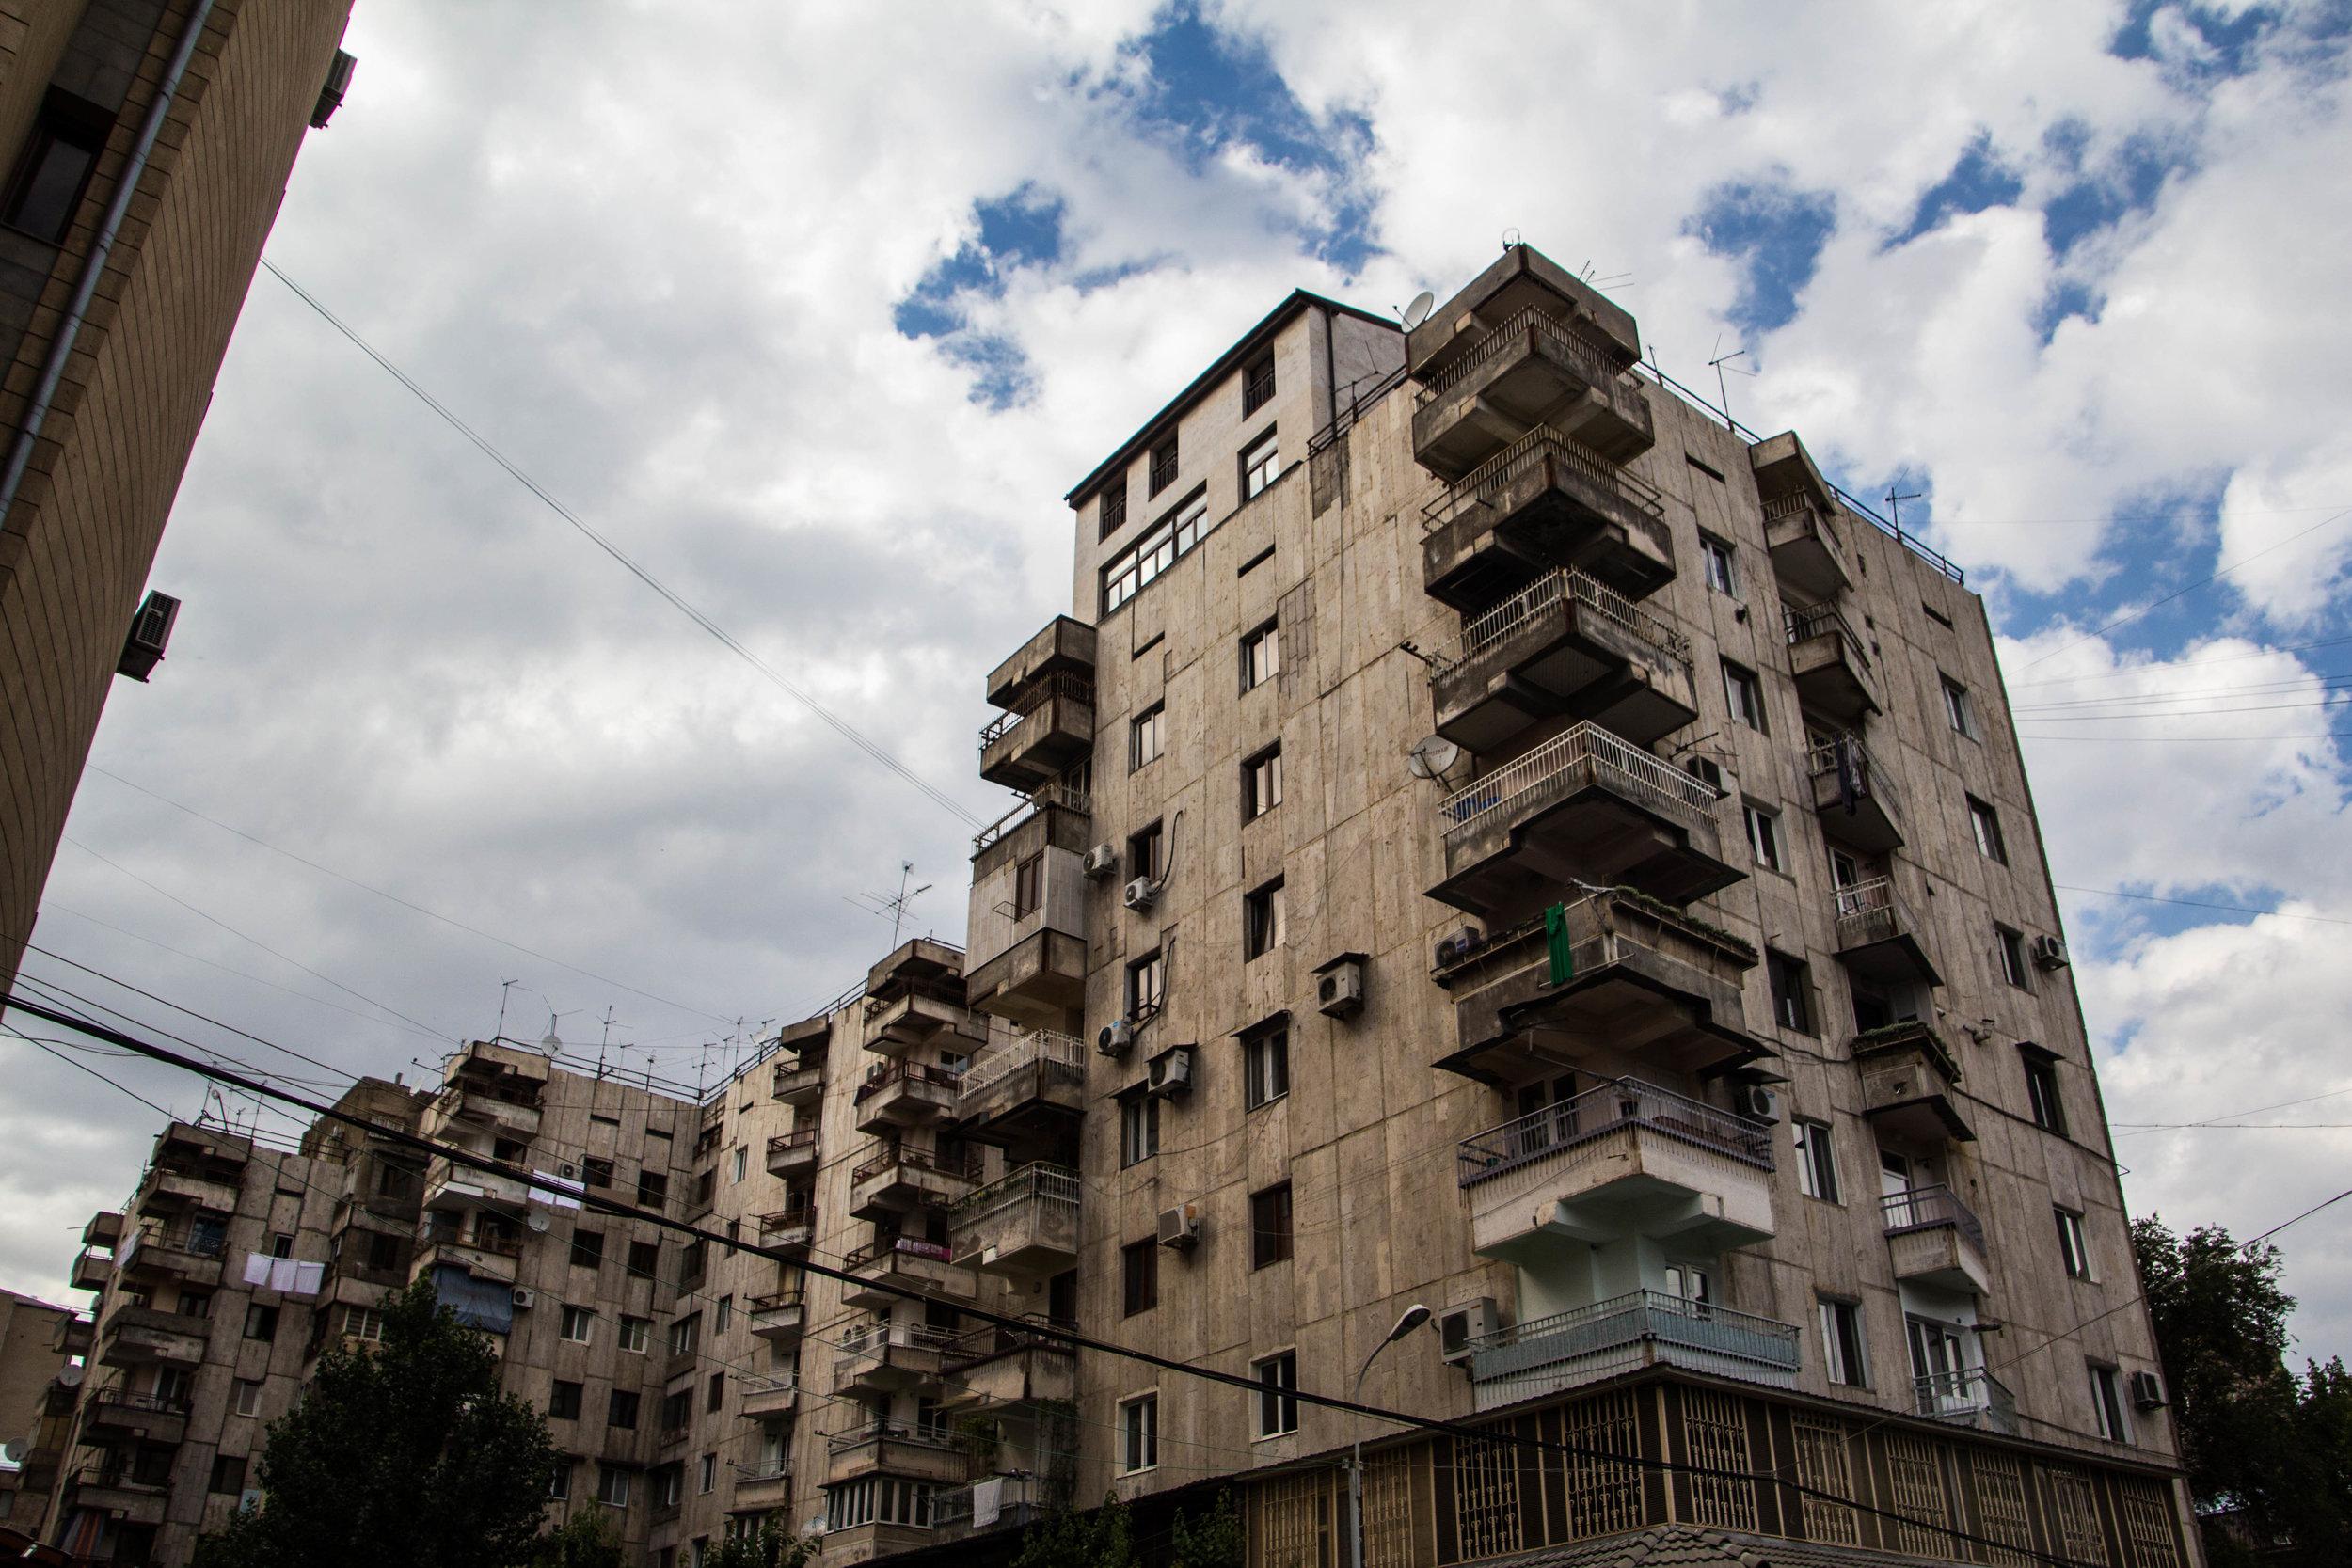 yerevan-armenia-streets-1-4.jpg